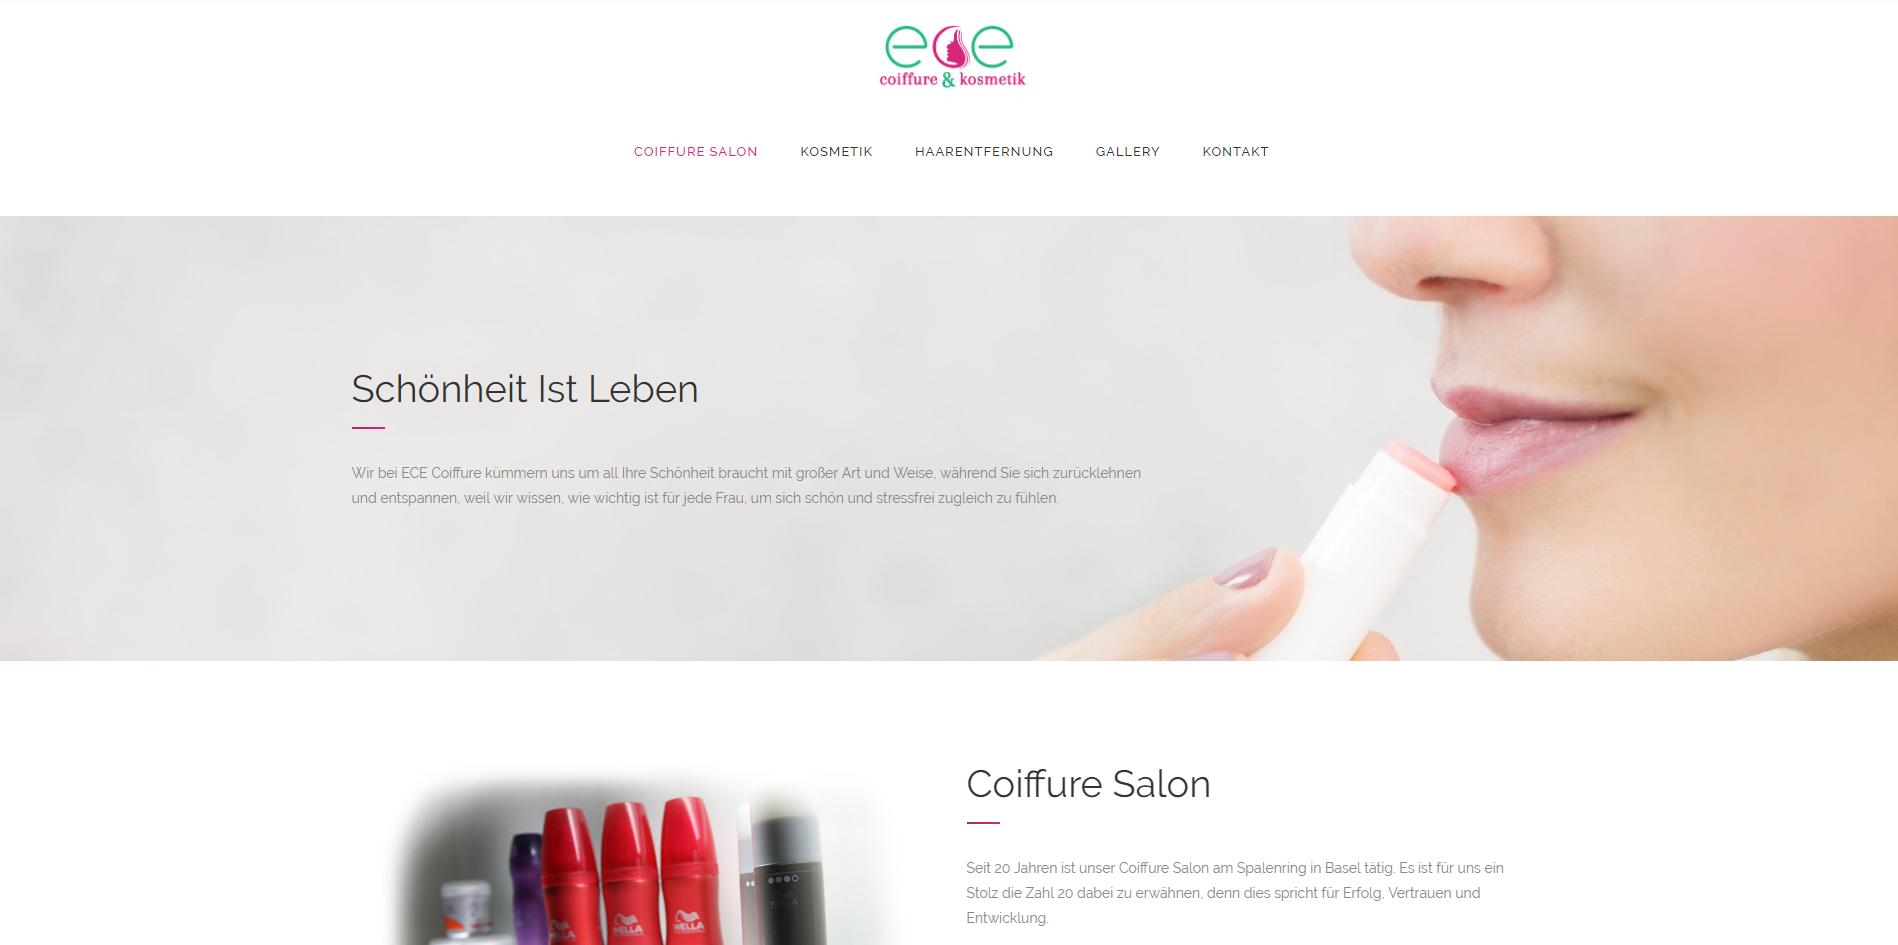 Ece Coiffure – Coiffure & Kosmetik